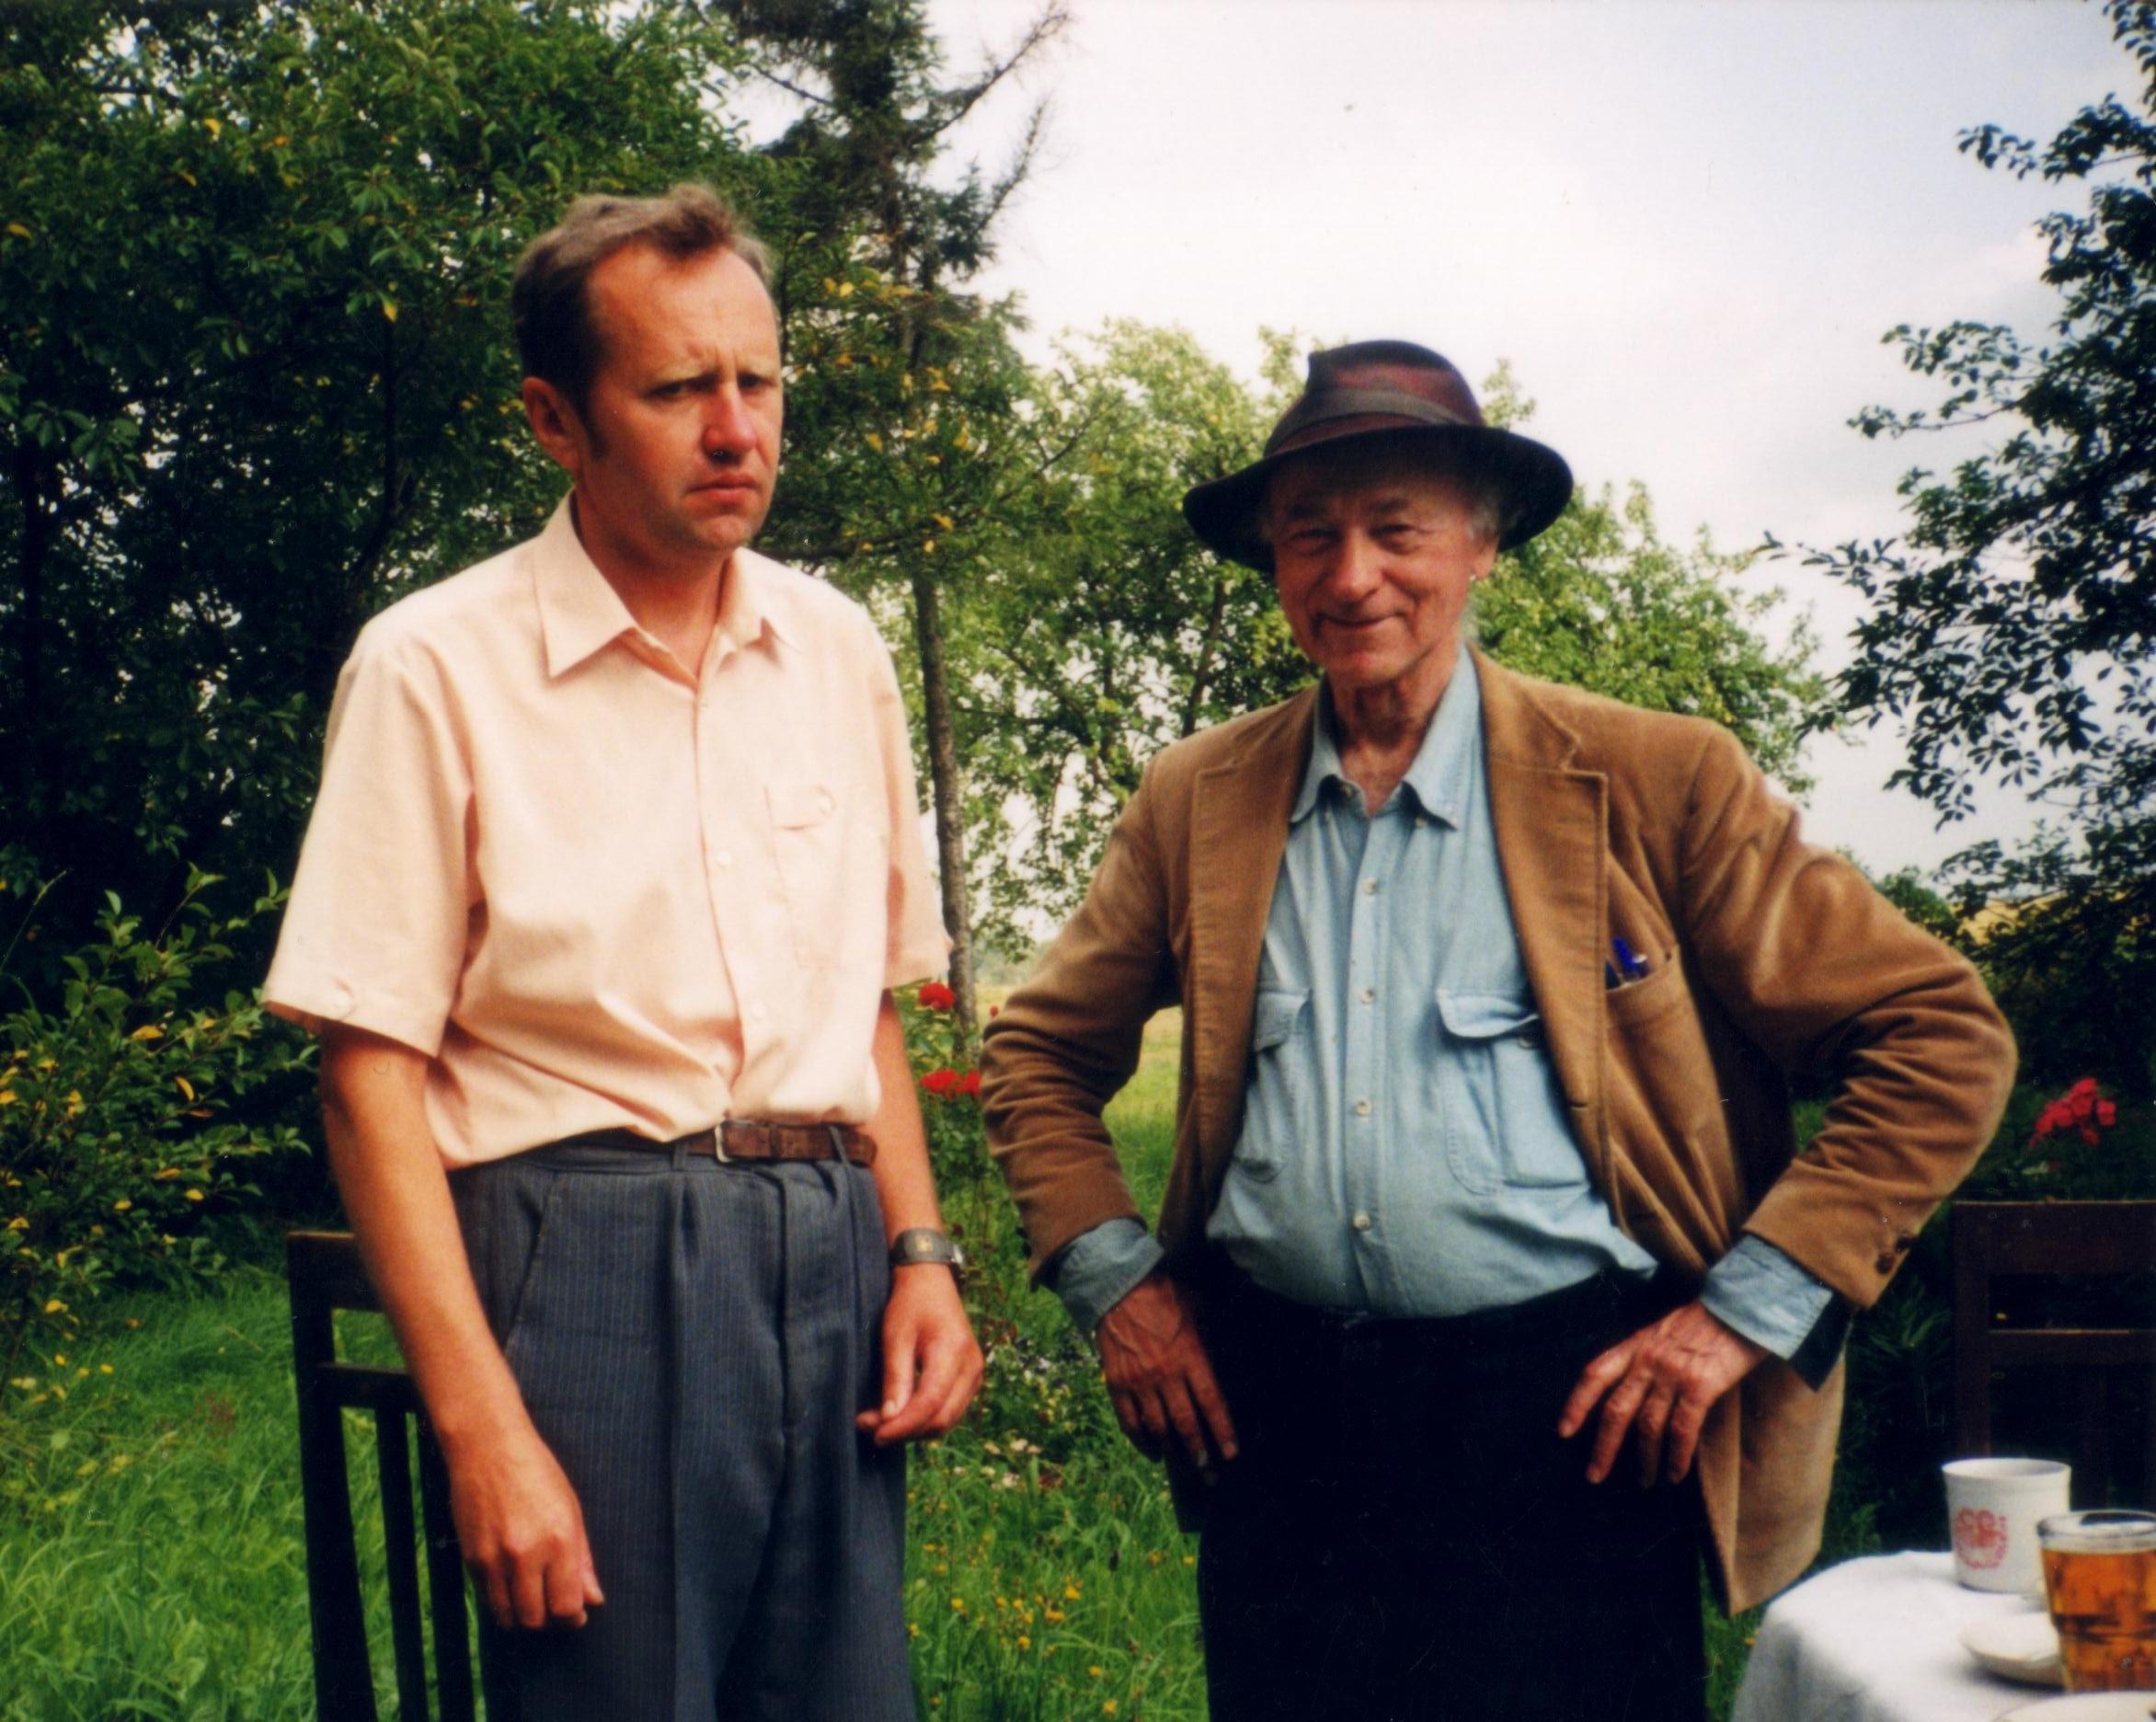 Savo gimtojoje sodyboje Gėsaluose su Jonu Meku. 1995 08 07